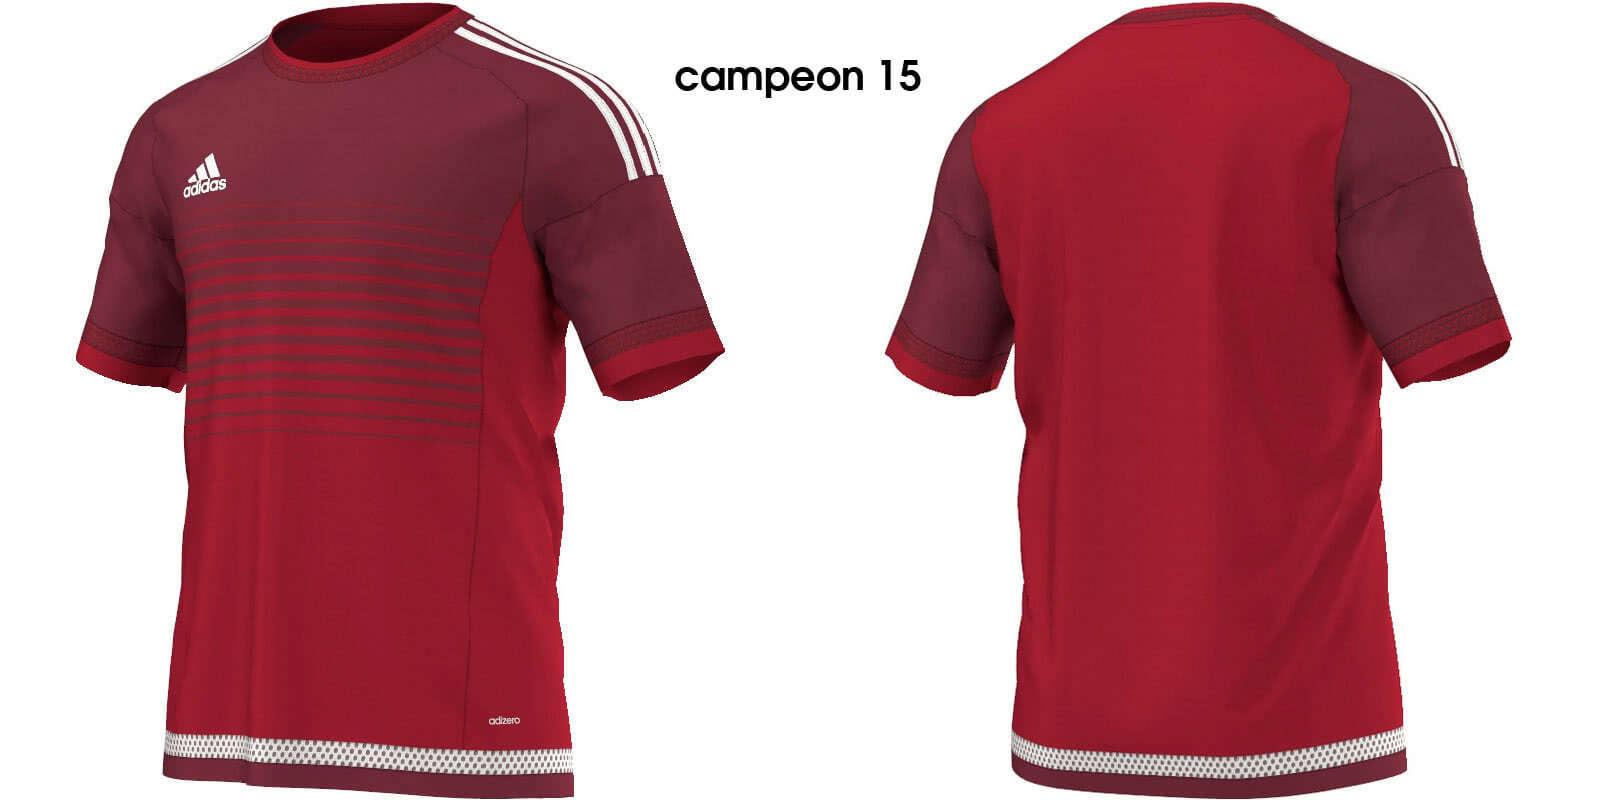 ca18c9bd766744 Das Adidas Campeon 15 Trikot als Fußball Trikot in 5 Farbkombinationen